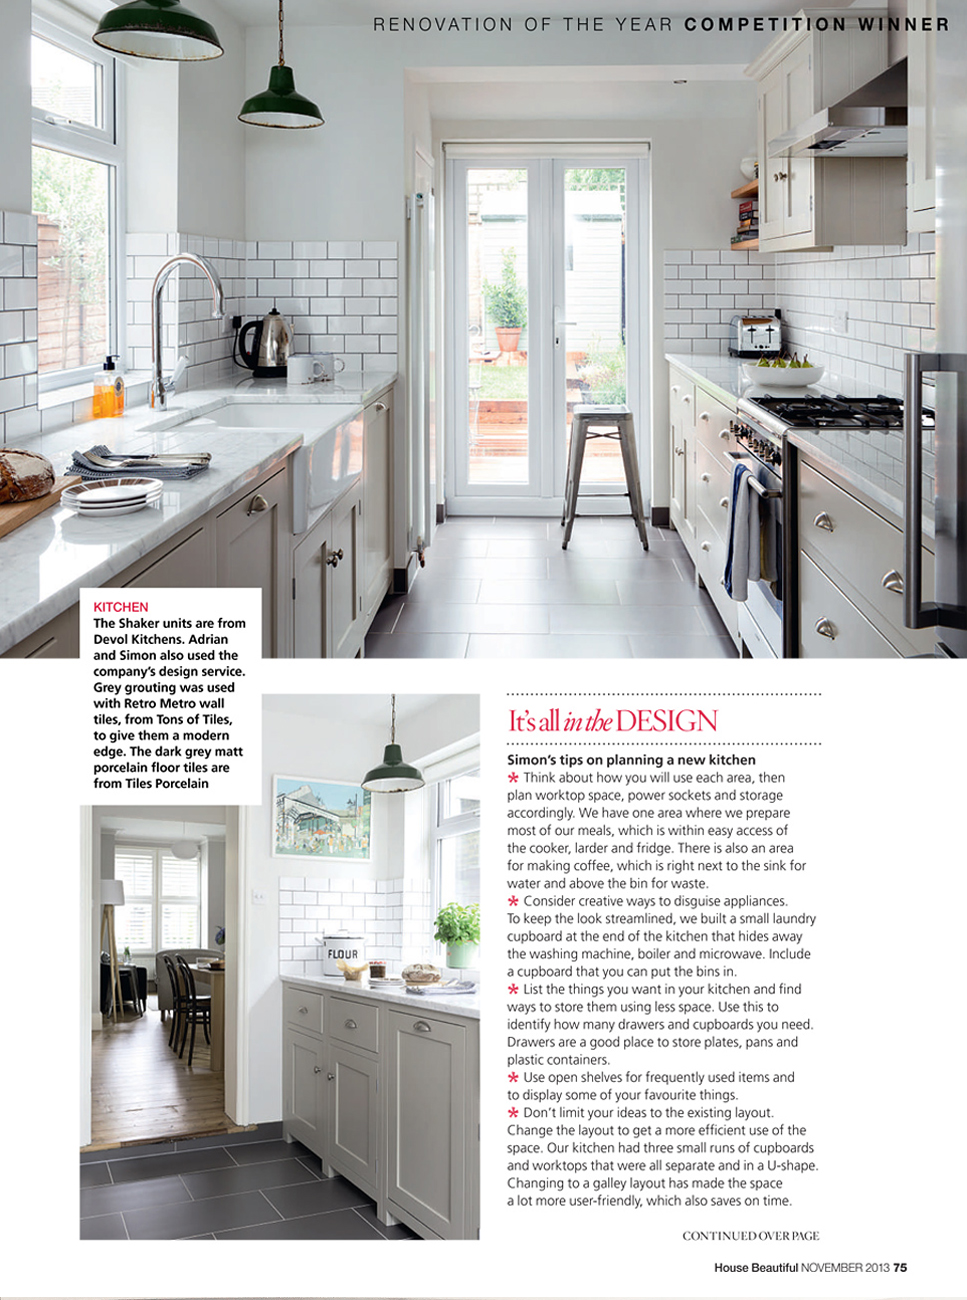 House Beautiful | deVOL Kitchens